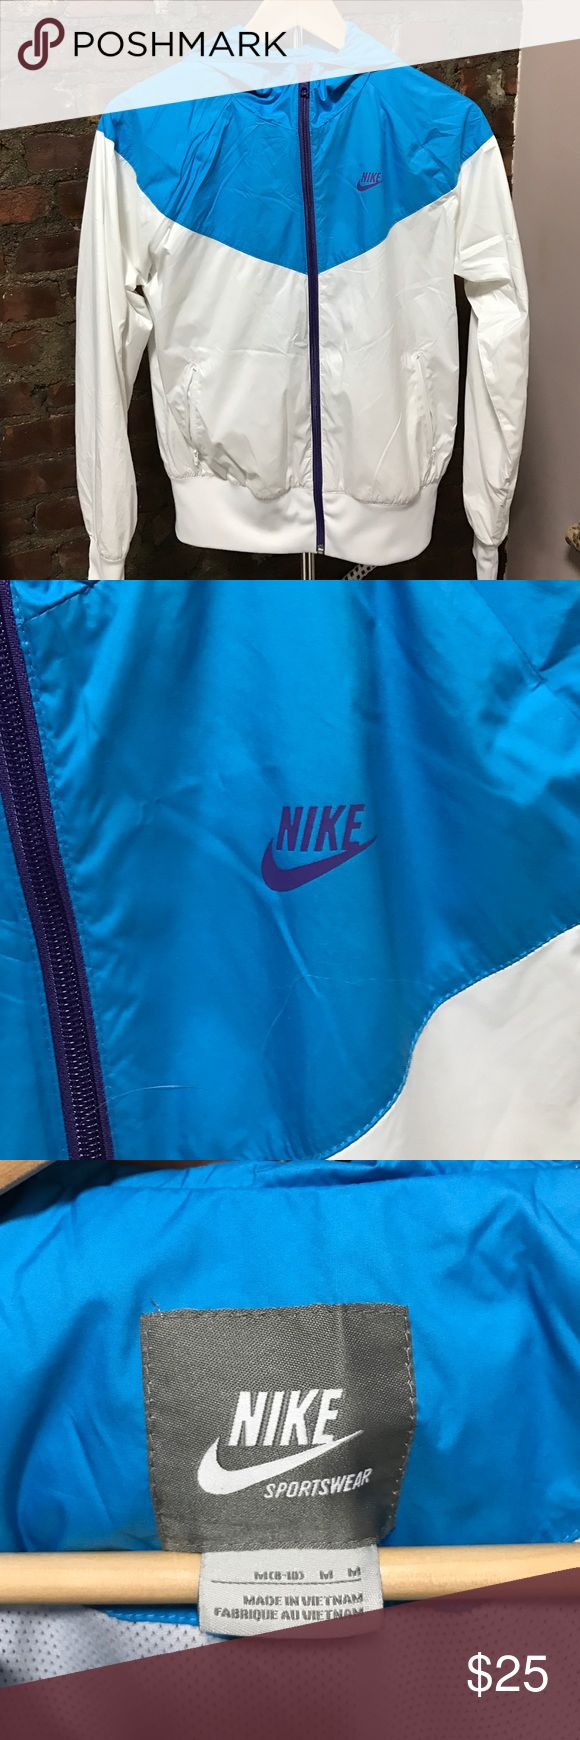 Nike Womens's Windbreaker Track Jacket Nike Women's size Medium Track Jacket/windbreaker. Great for working out! Nike Jackets & Coats